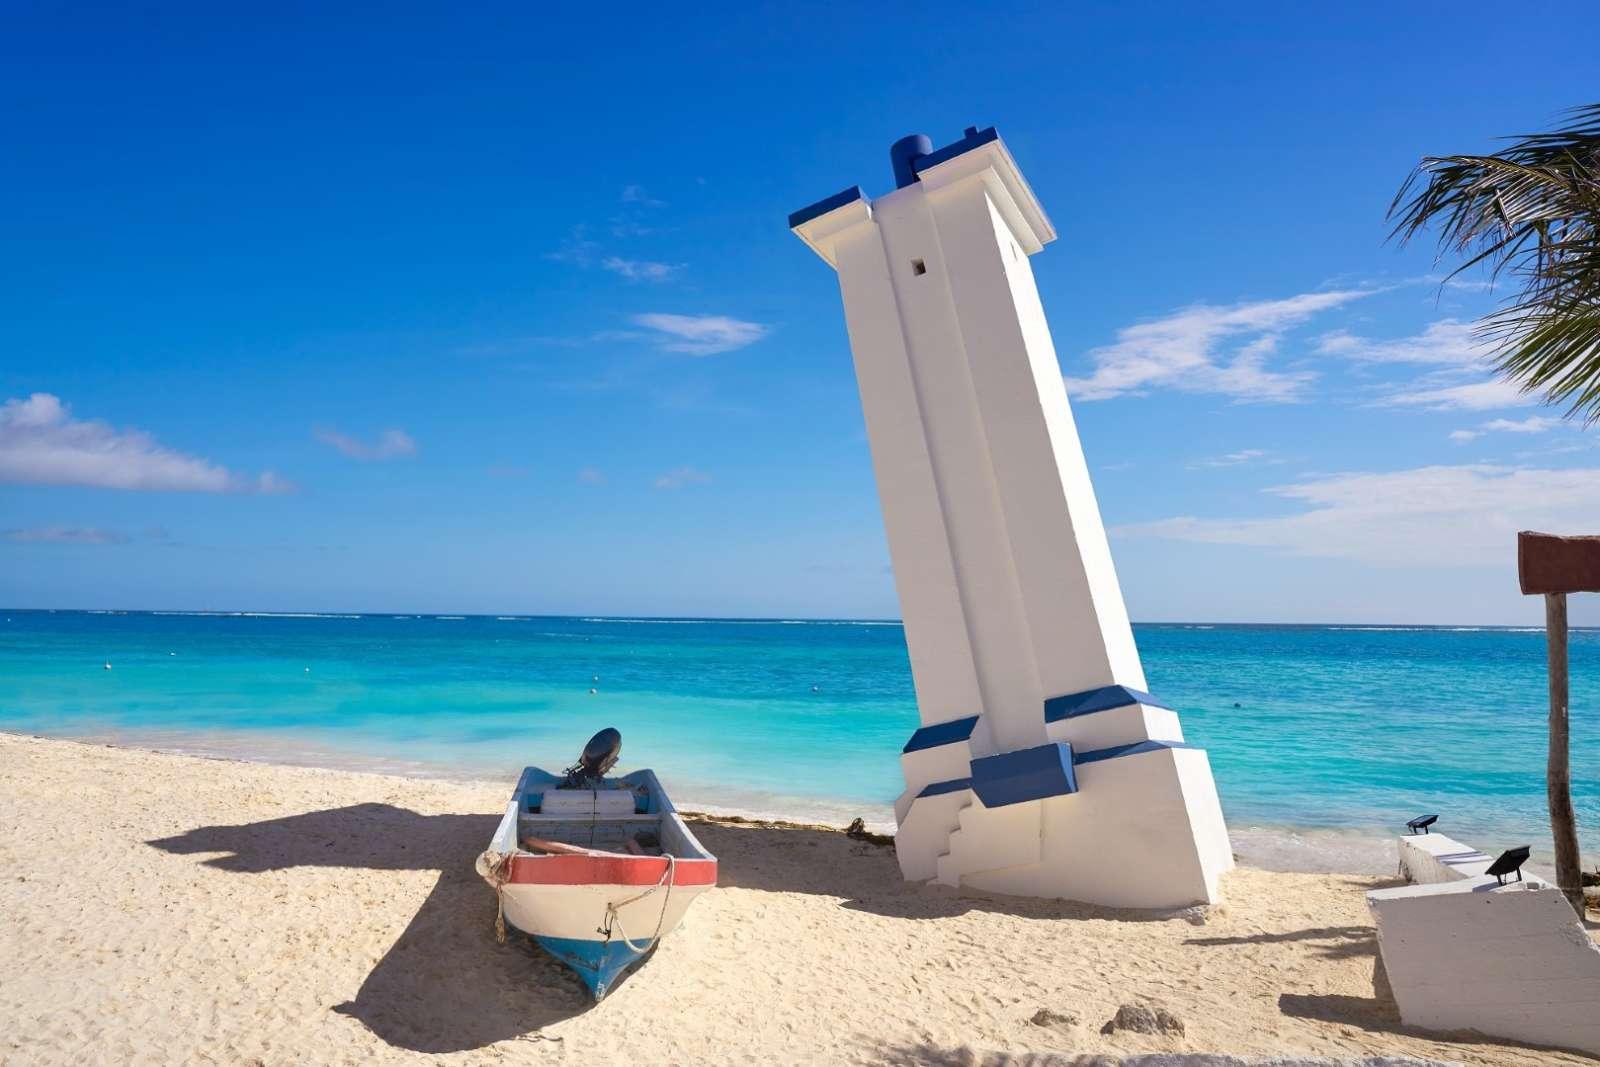 Lighthouse at Puerto Morelos on Riviera Maya Mexico